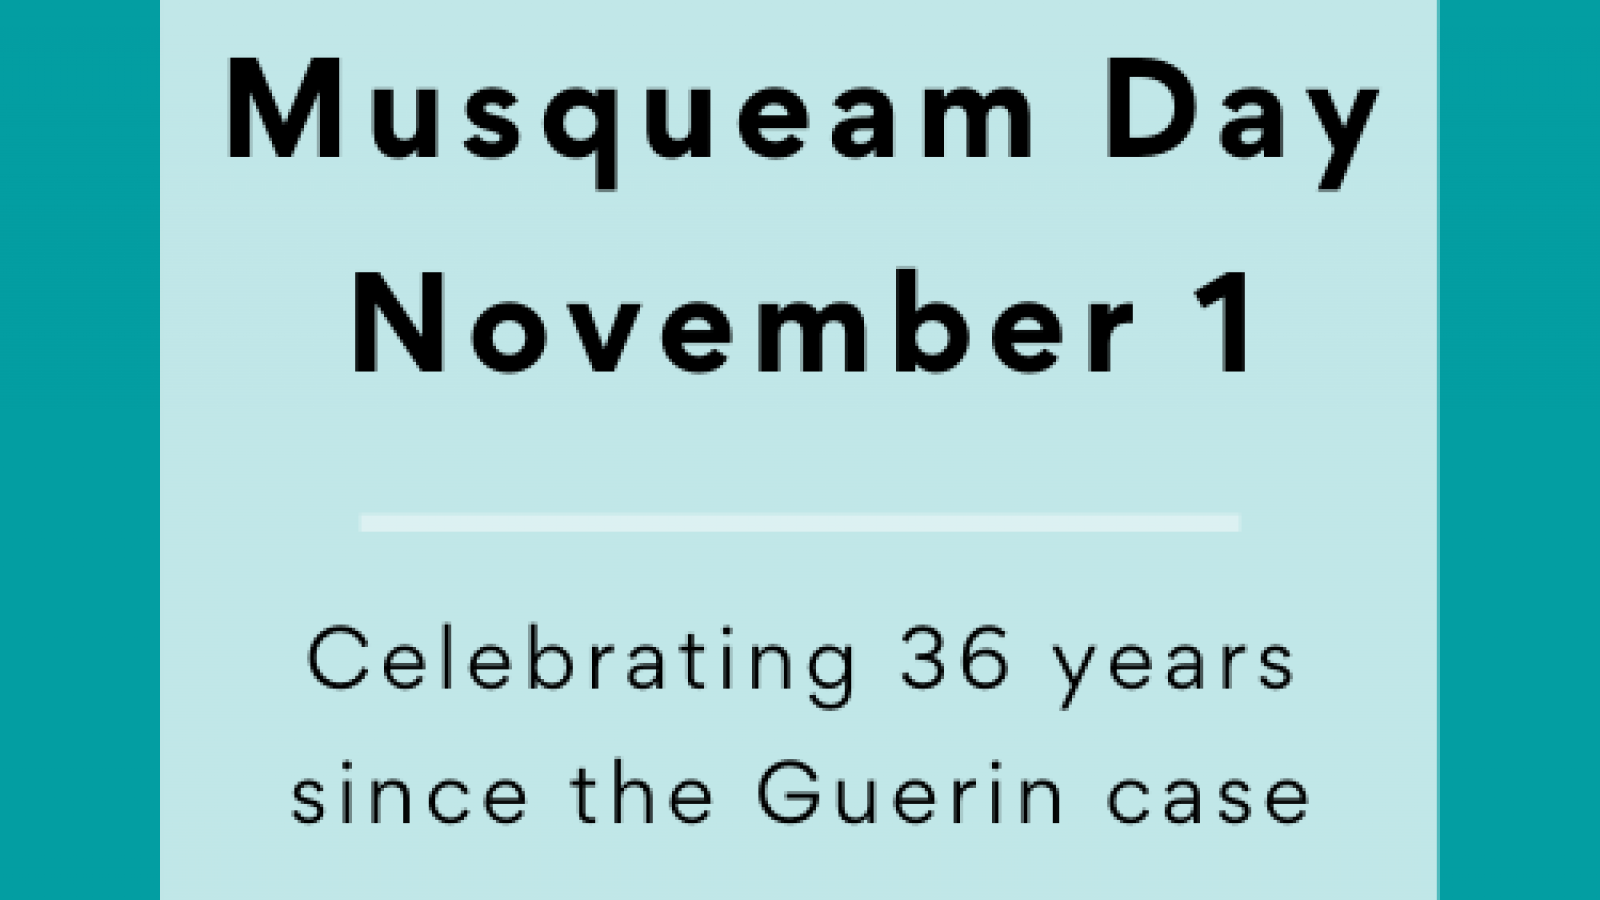 musqueam day november 1